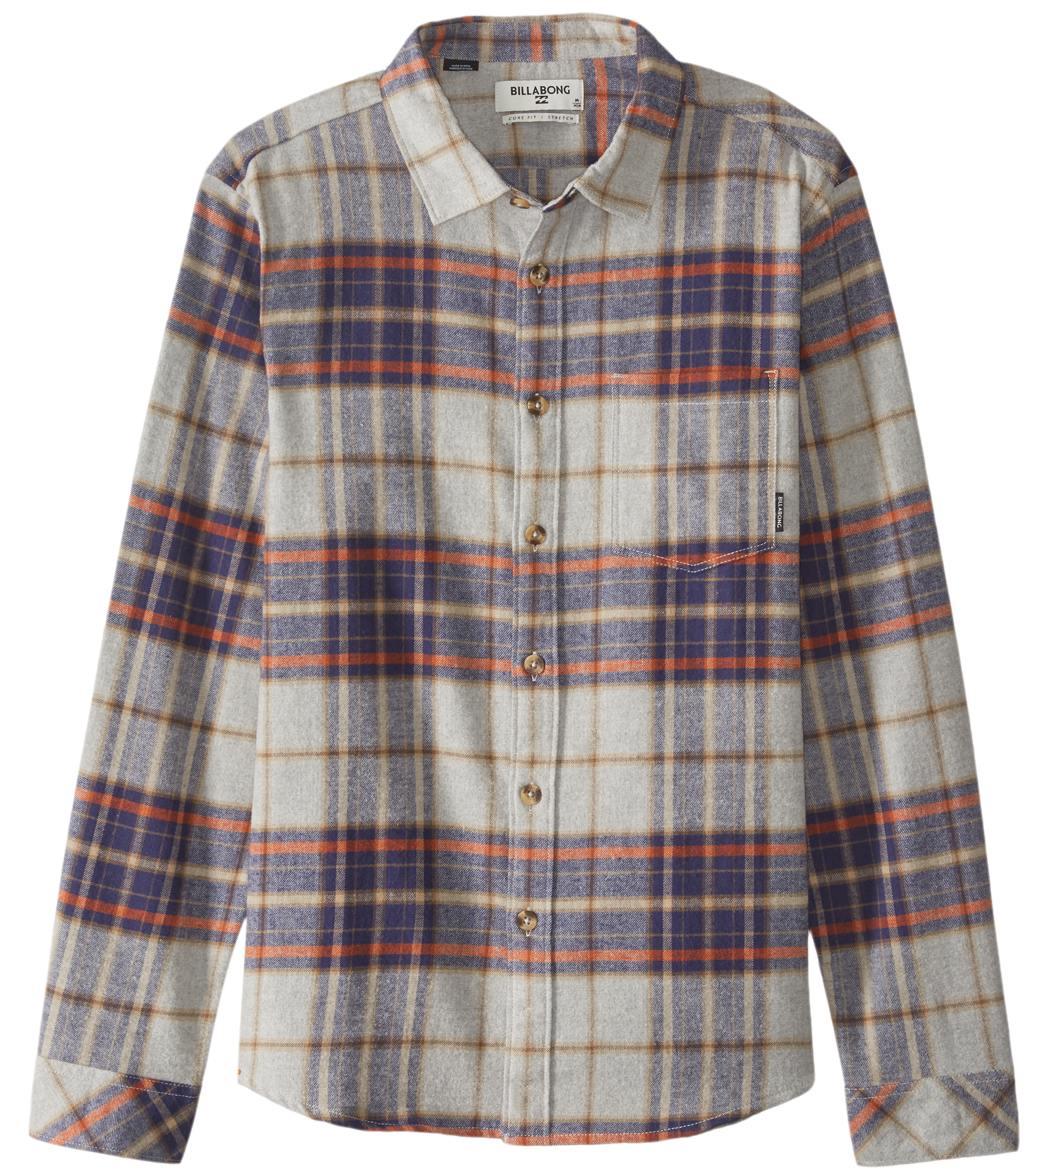 4b1fdfc3b Billabong Men's Coastline Flannel Shirt at SwimOutlet.com - Free ...